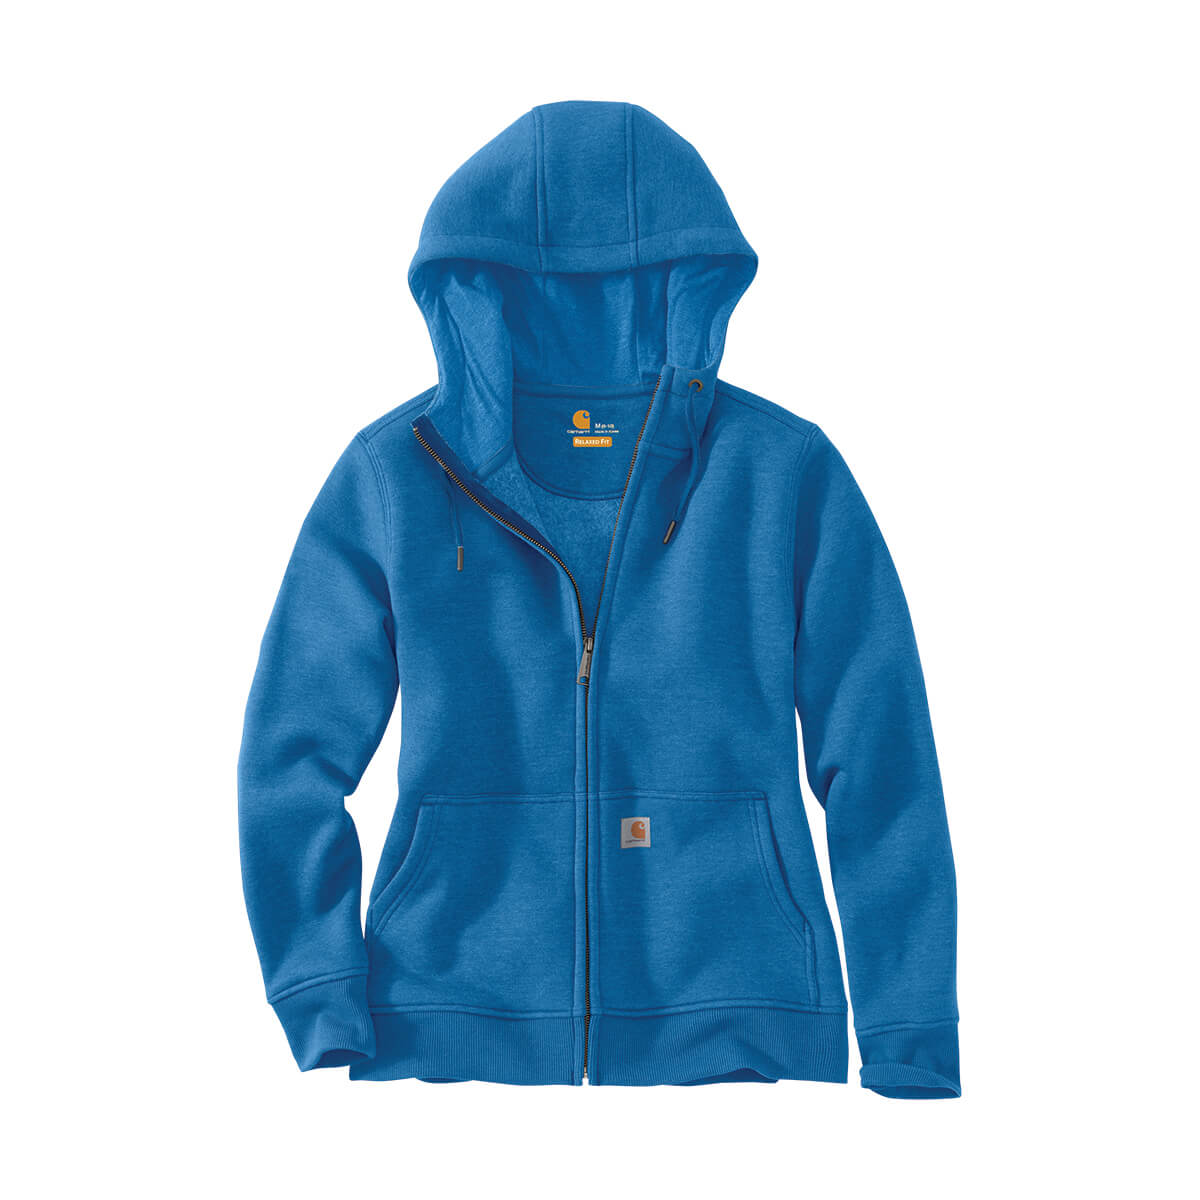 Women's Full Zip Hoodie, Light Blue - XL